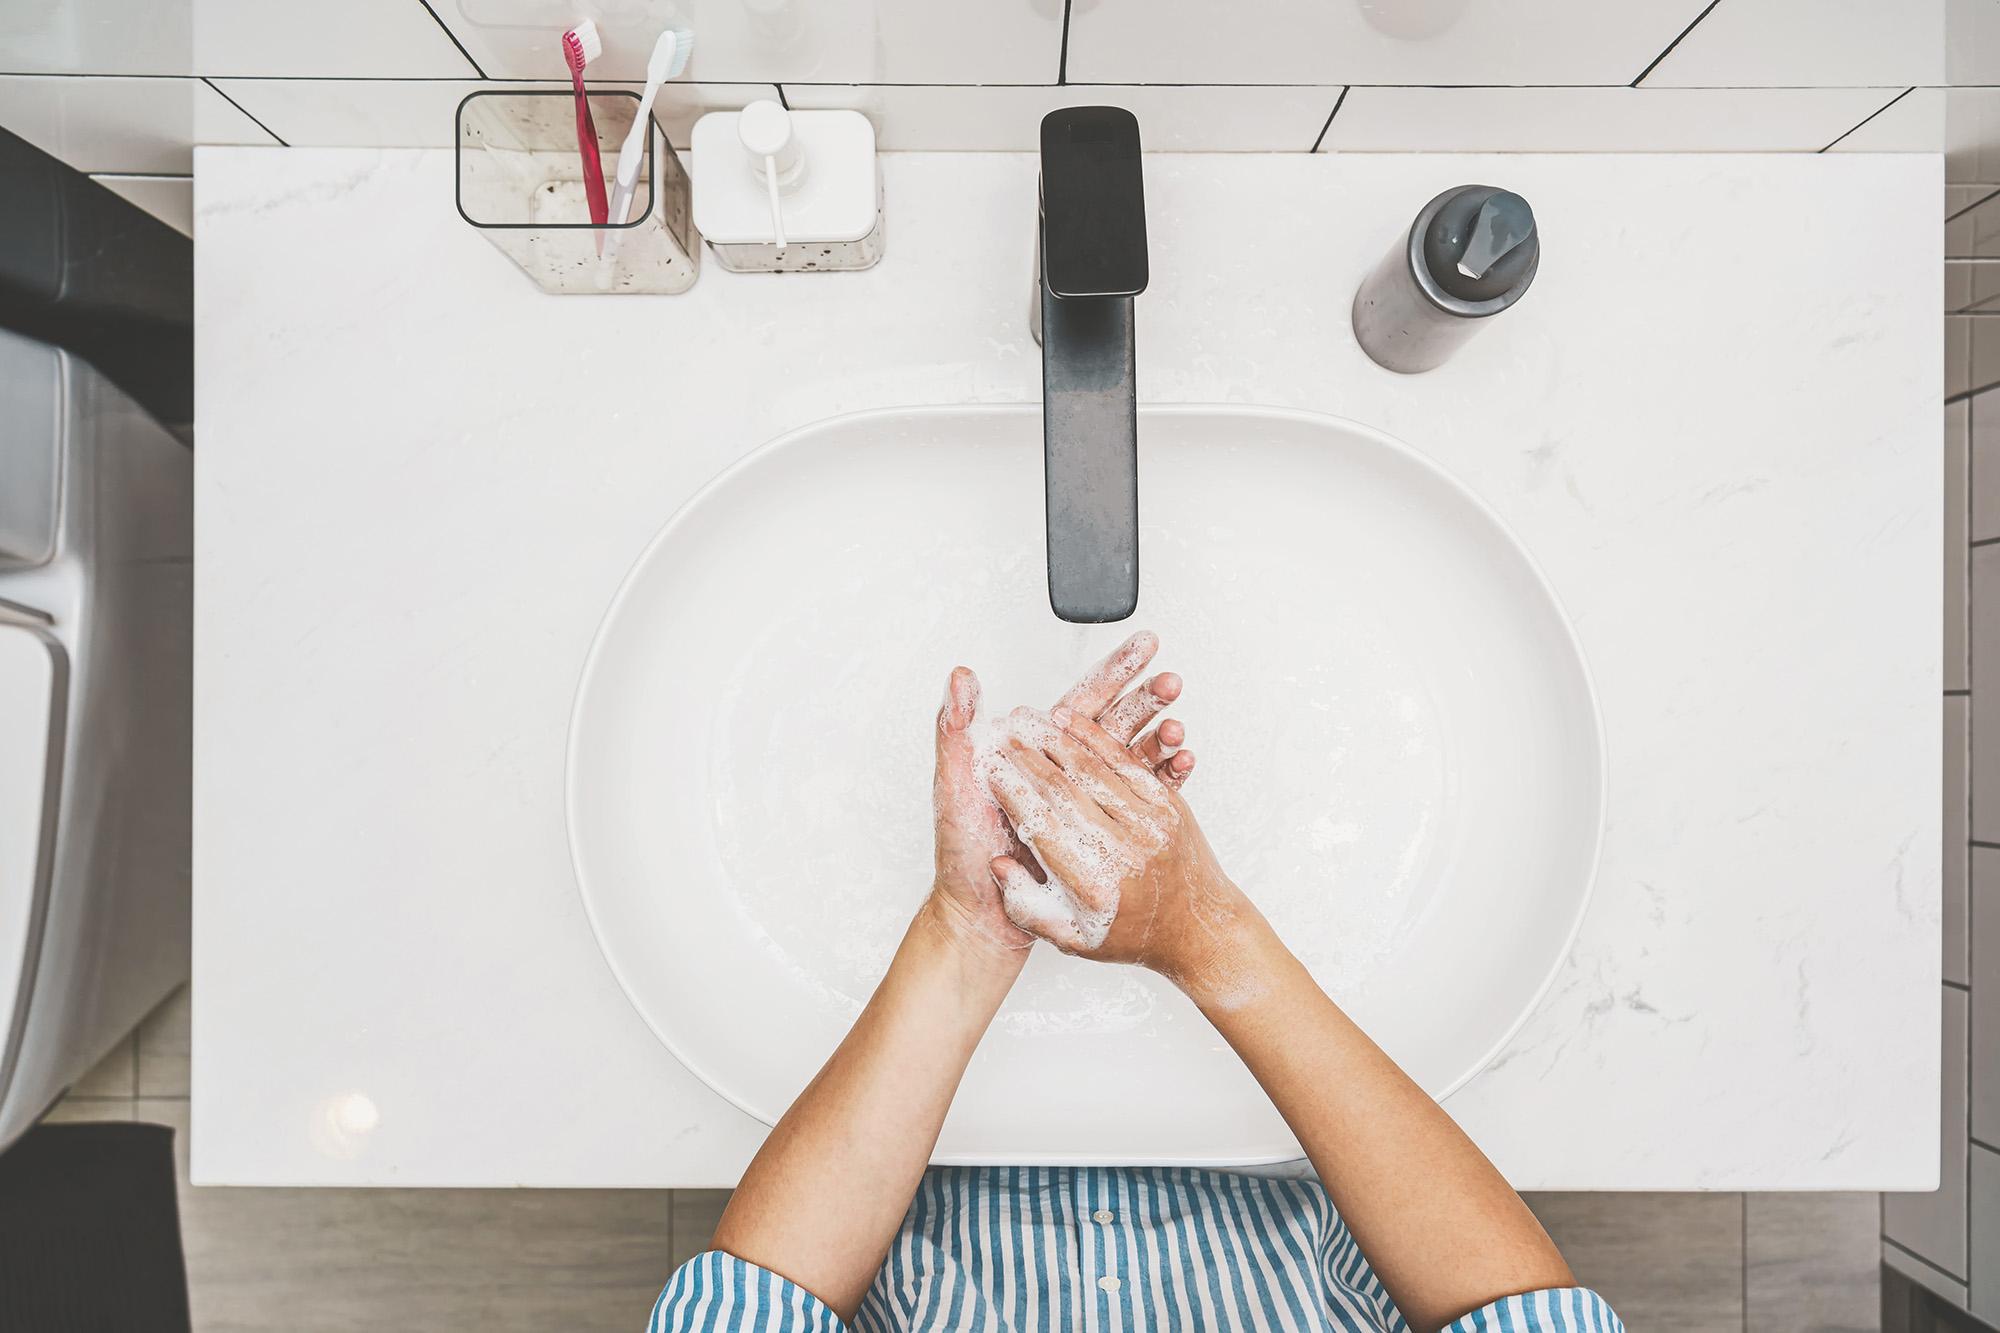 Bőrápolás karantén alatt